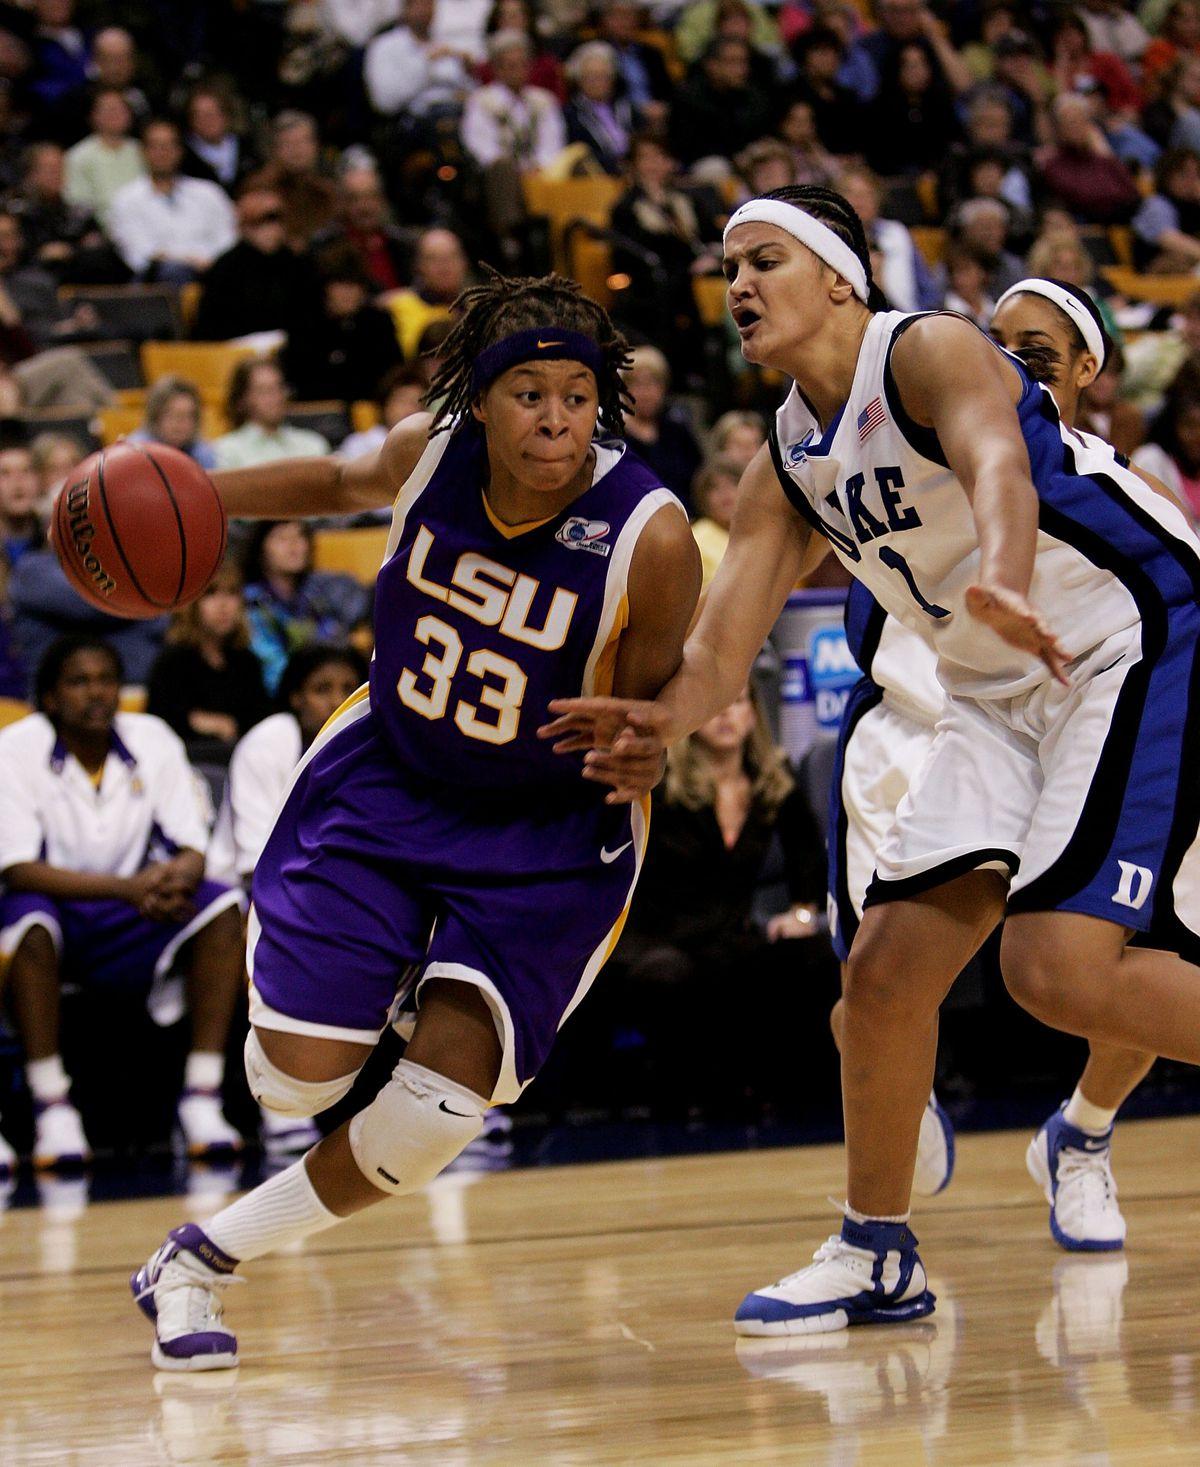 Louisiana State University Lady Tigers v Duke Blue Devils